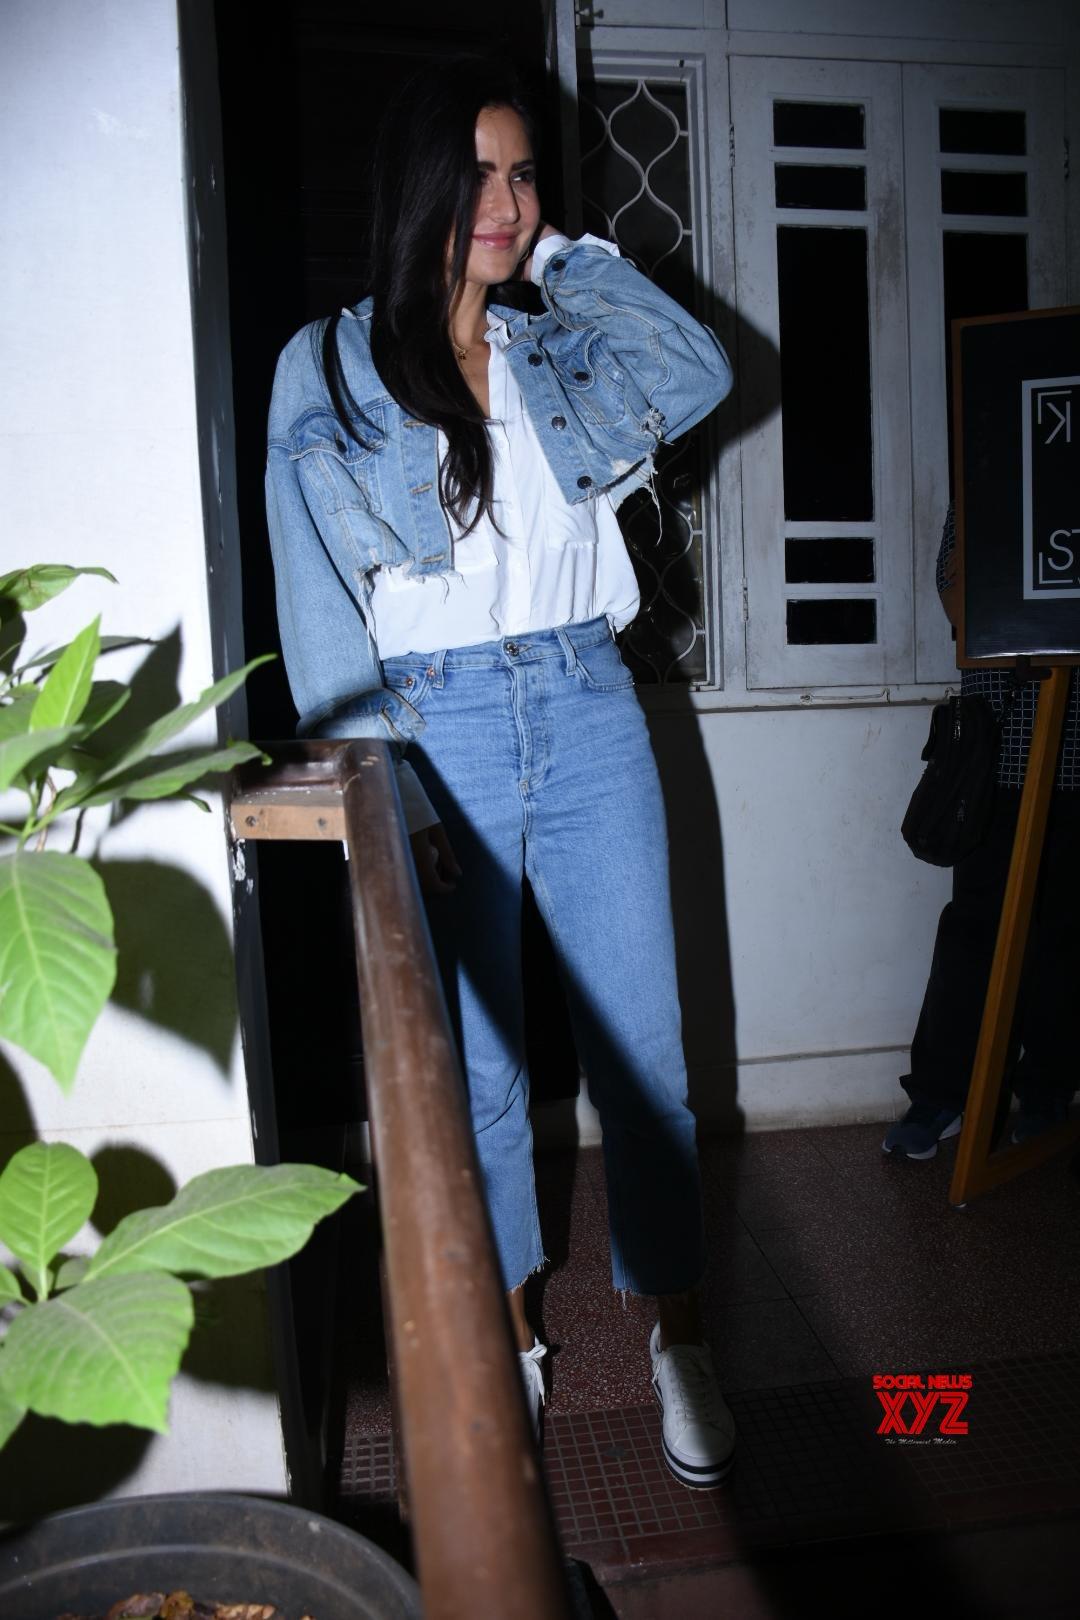 Actress Katrina Kaif Spotted At Krome Studio In Bandra - Gallery